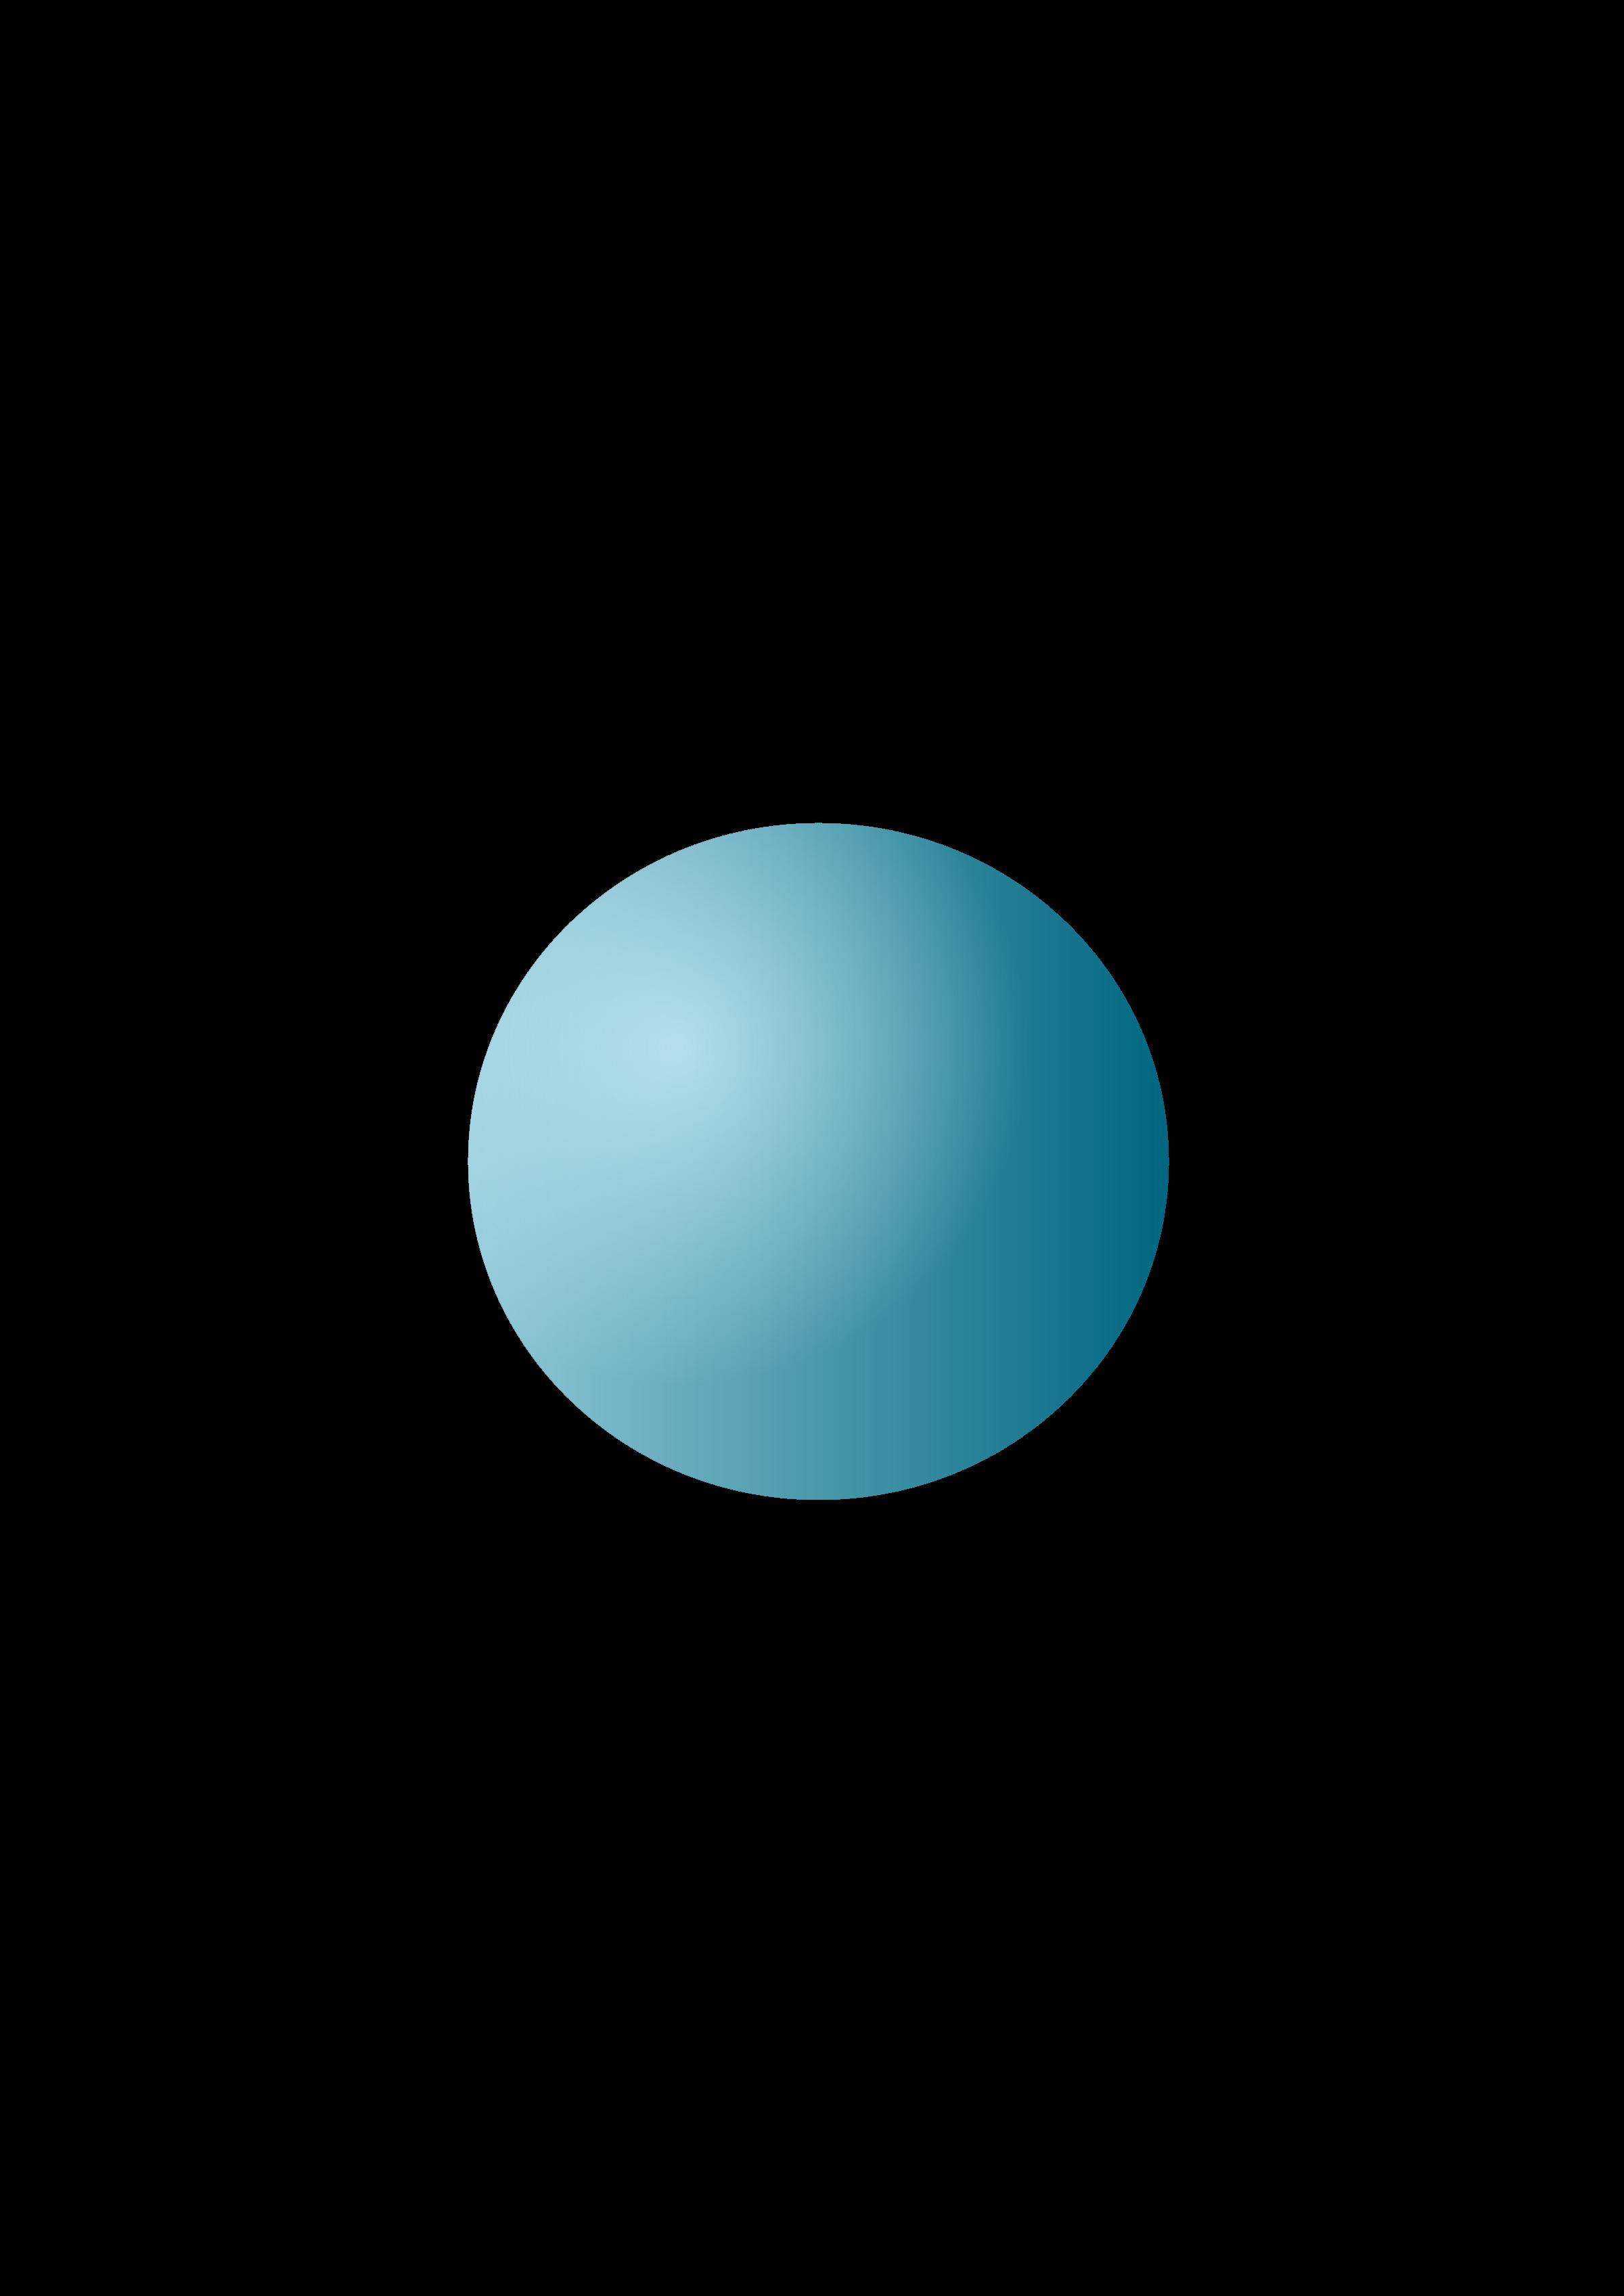 Marbles transparent frames illustrations. Planeten clipart uranus